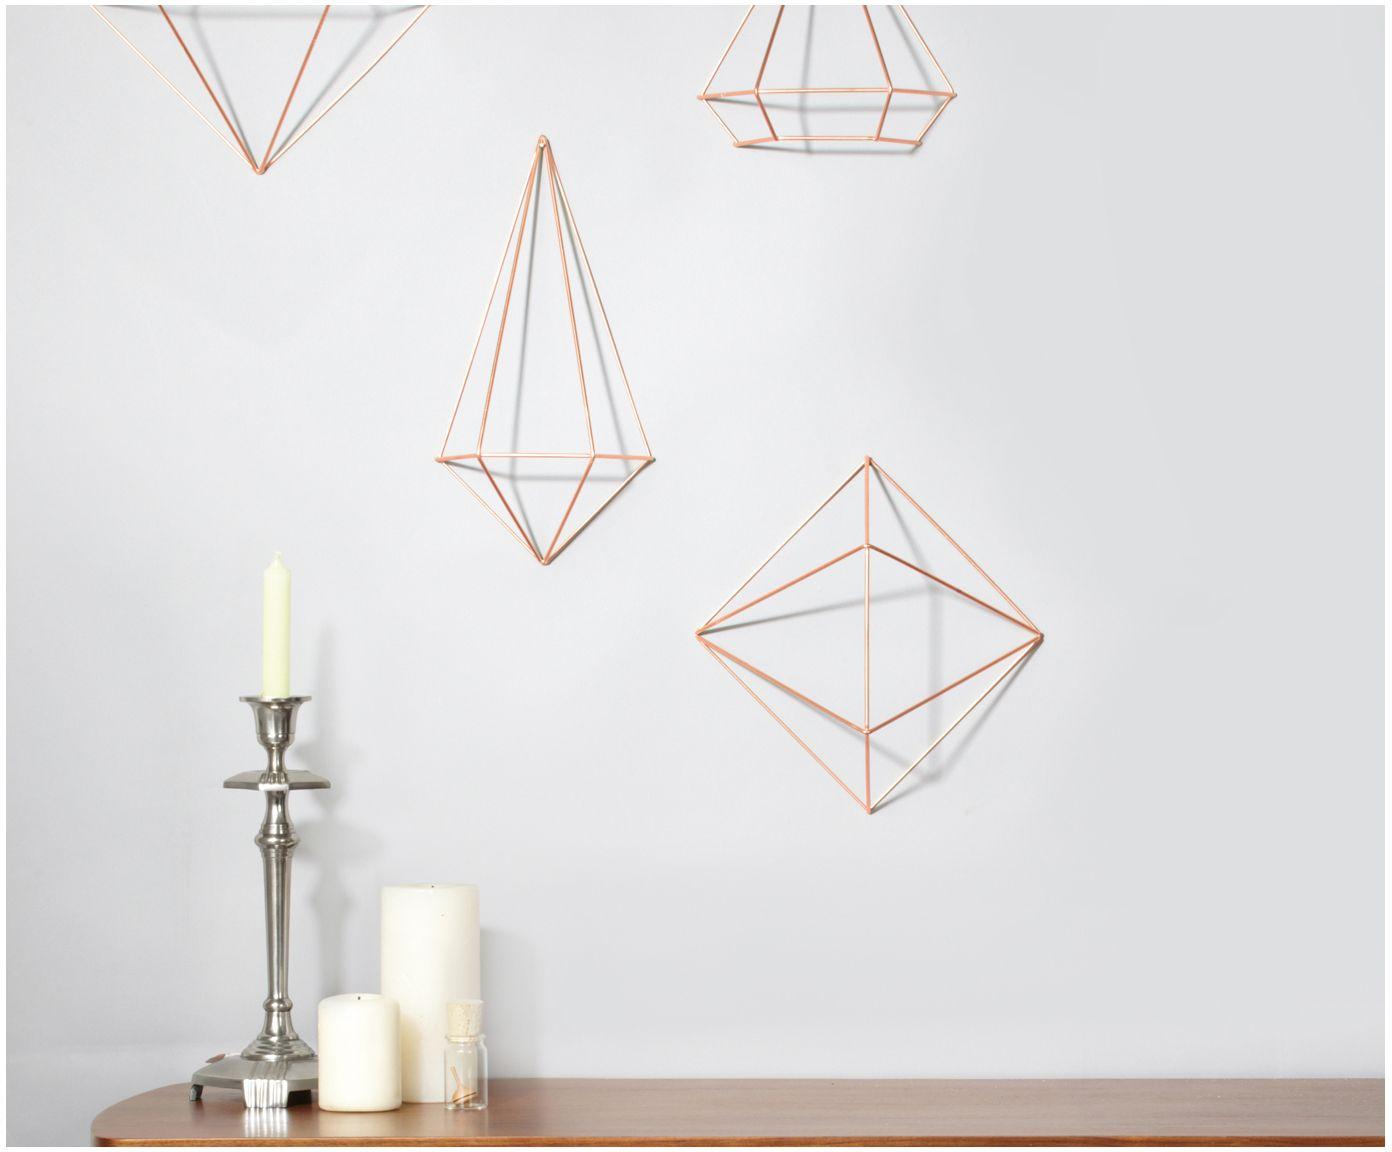 Fesselnd AFFILIATELINK | Wand Objekte Set Prisma, 6 Tlg., Skandinavisch,